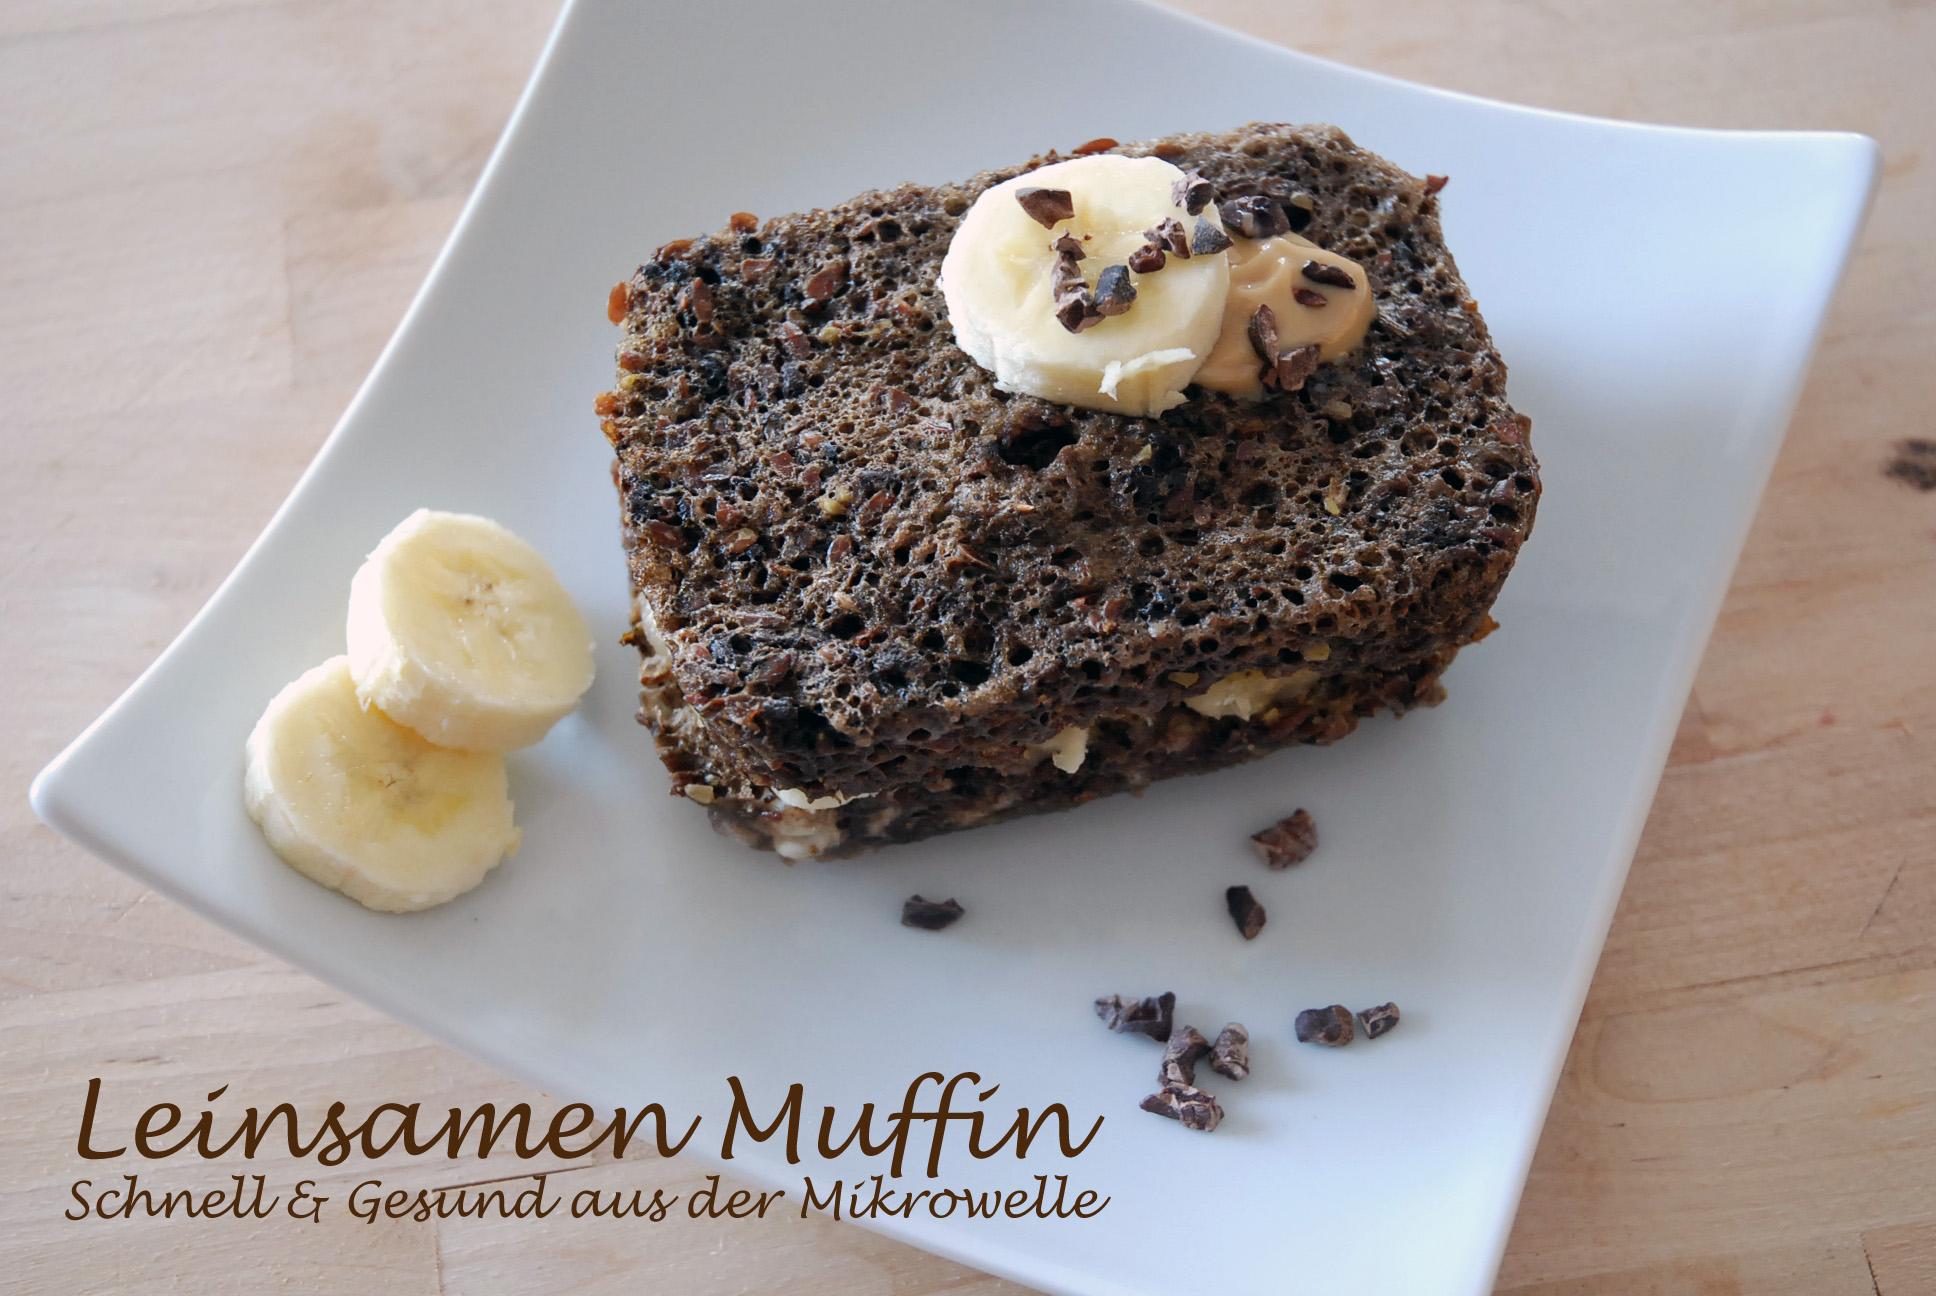 Leinsamen Muffin und Paleo / Flaxseed muffin and paleo